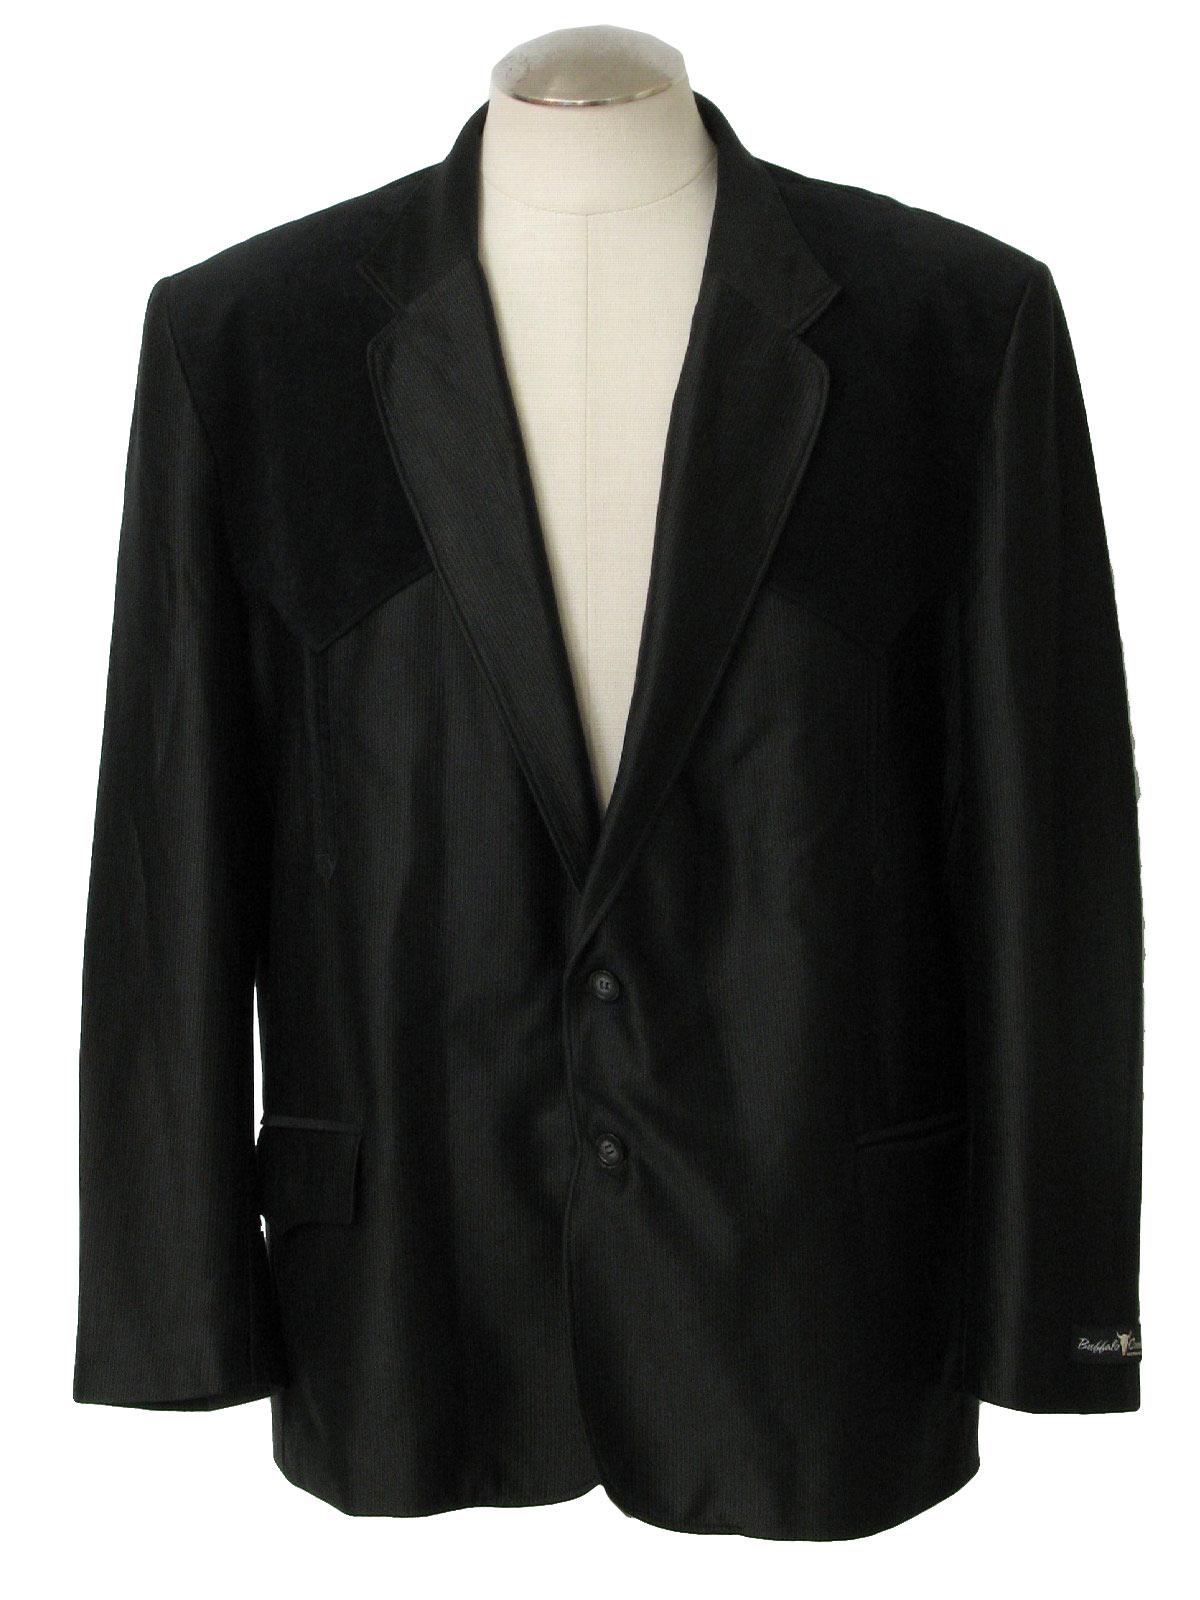 80s Retro Jacket 80s Buffalo Country Western Wear Mens